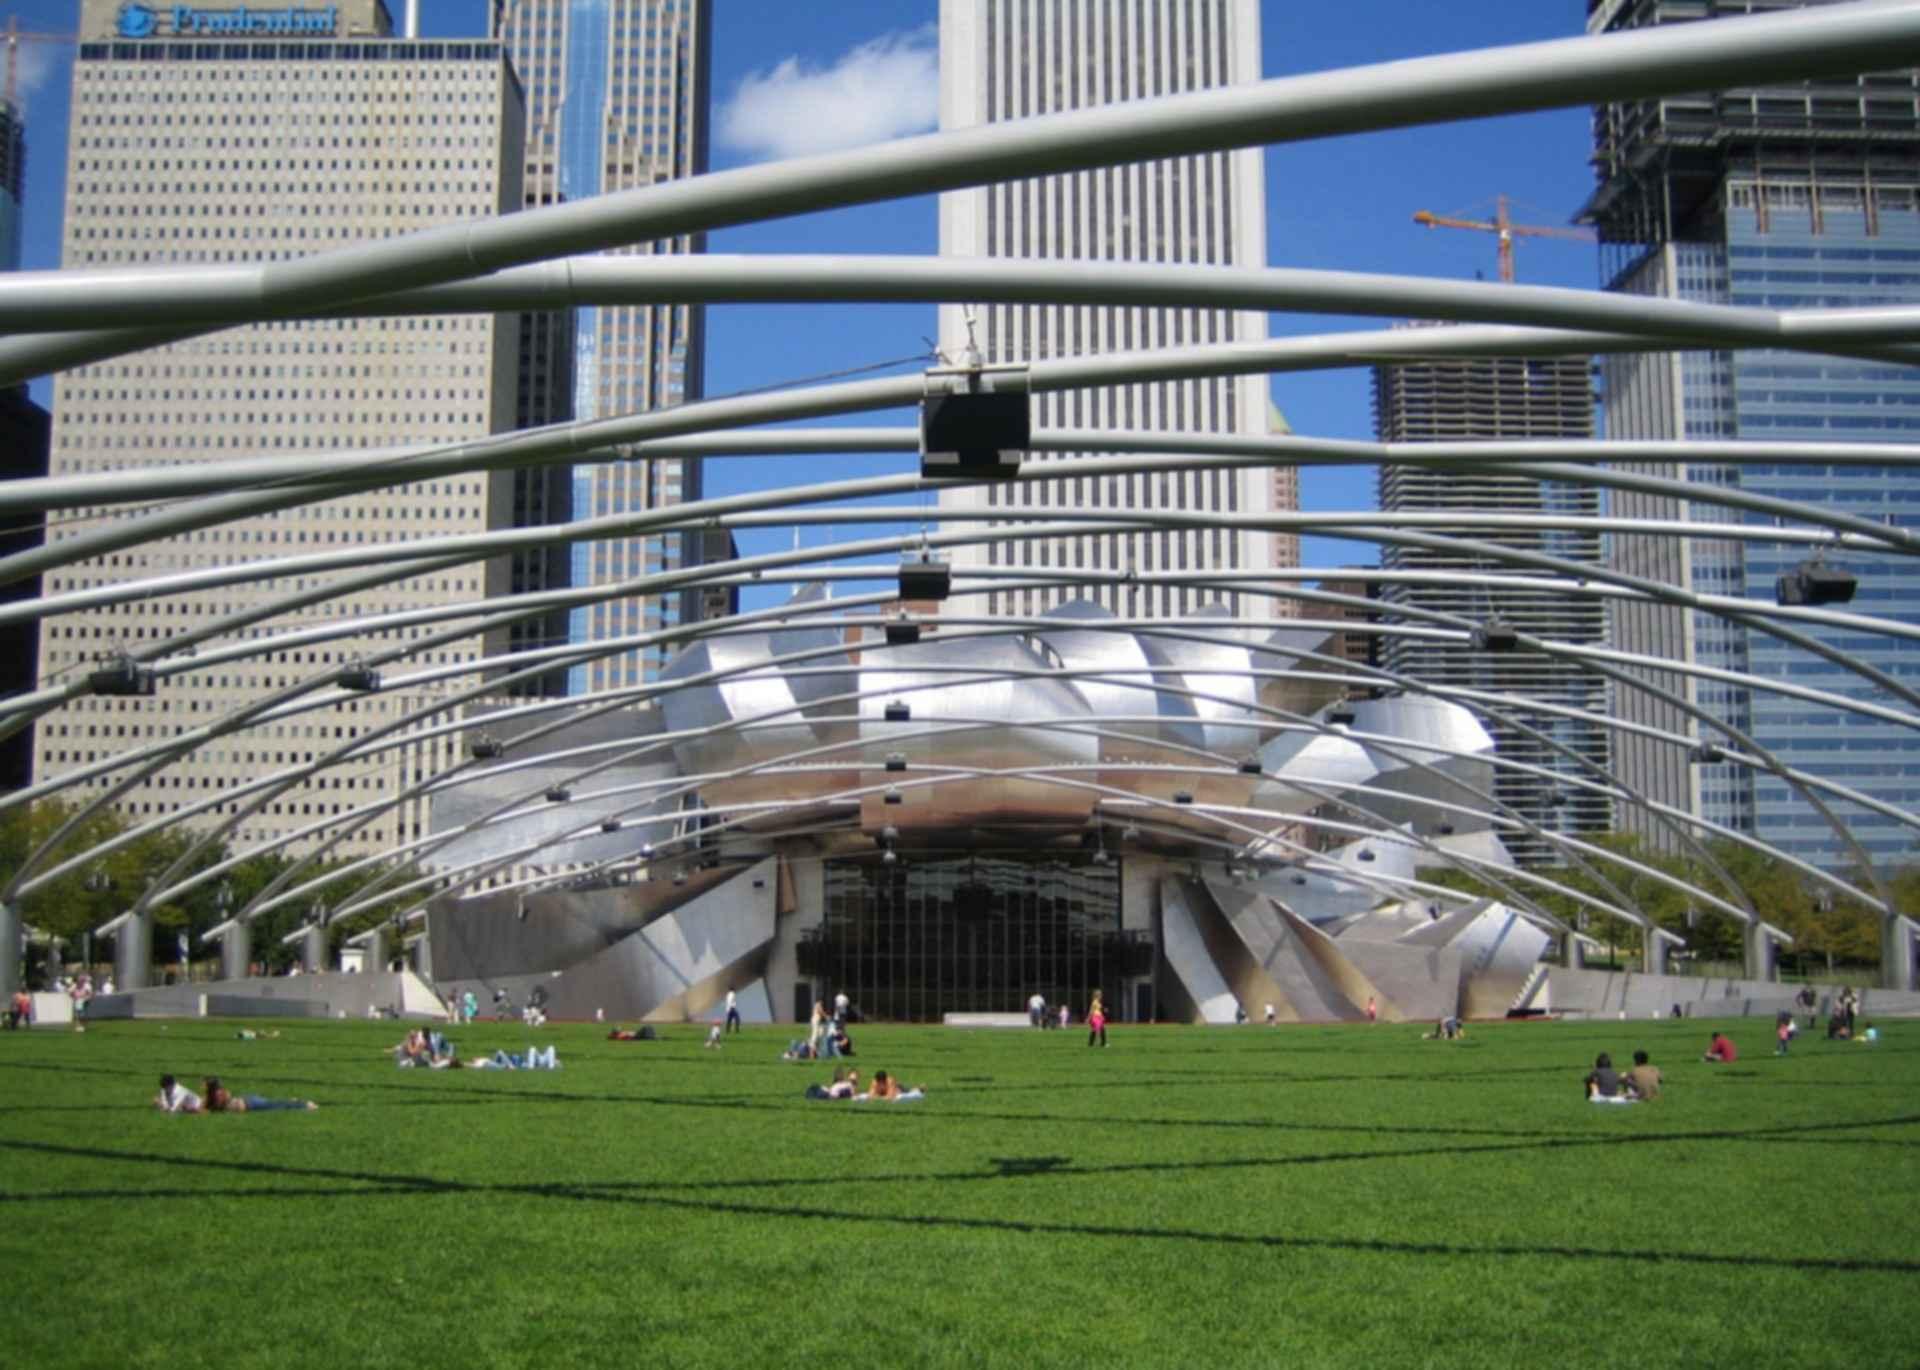 Jay Pritzker Pavilion - View From Park